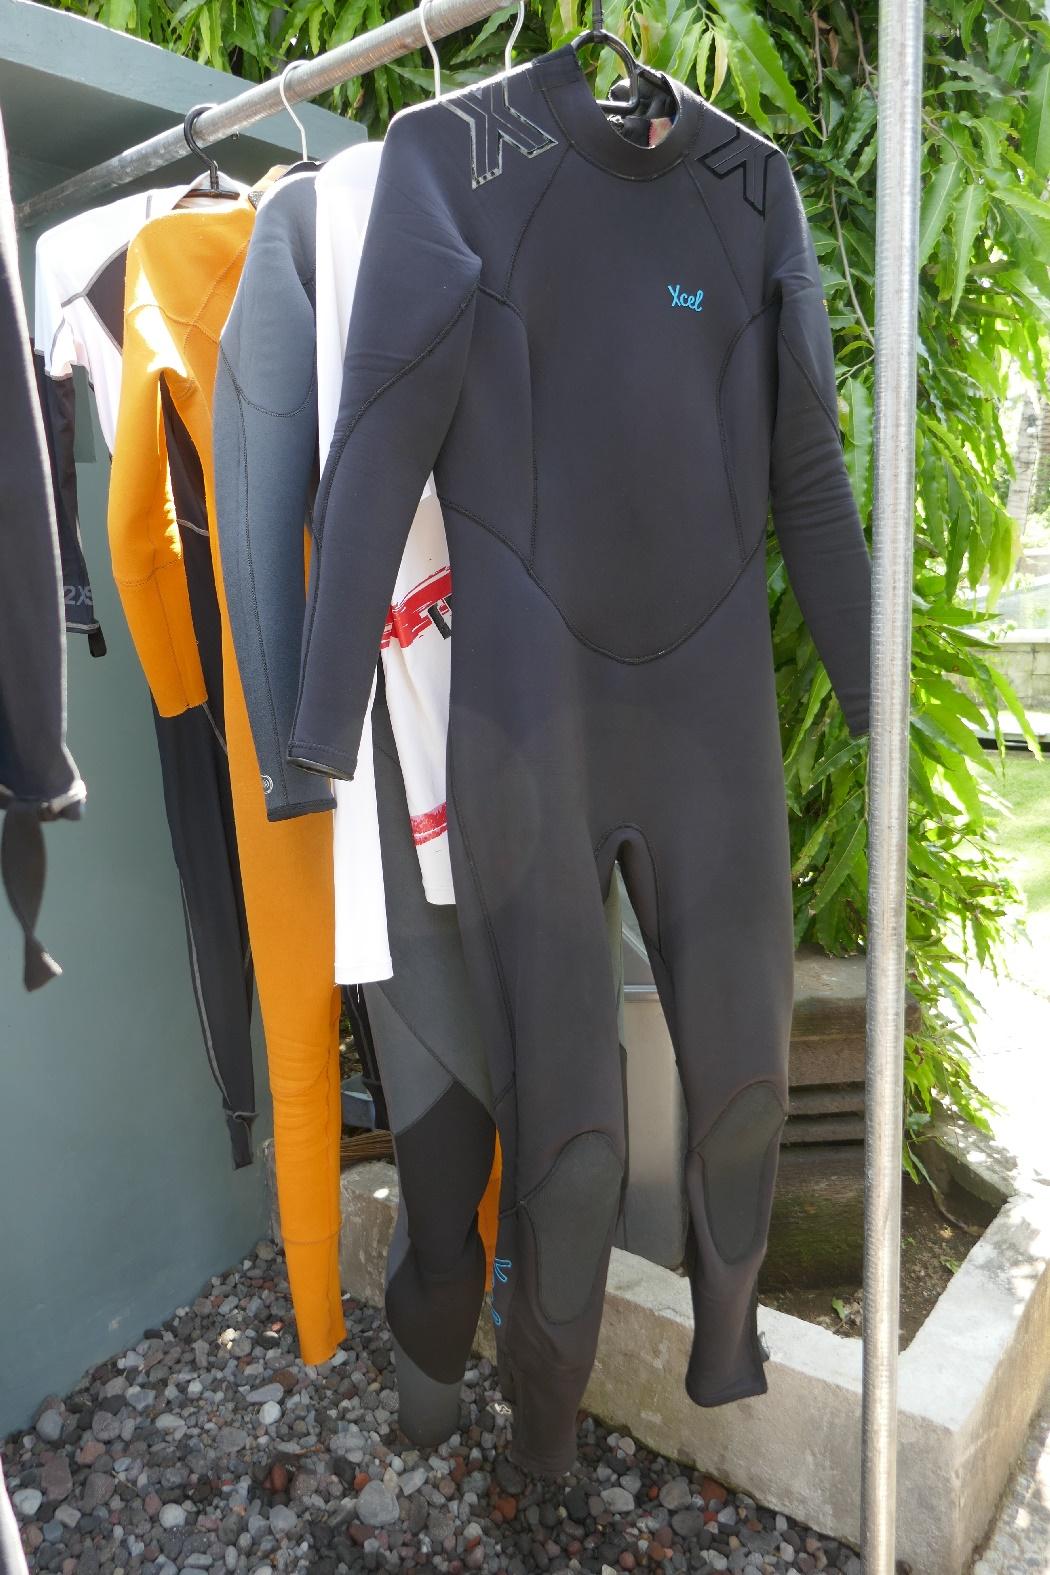 my xcel wetsuit